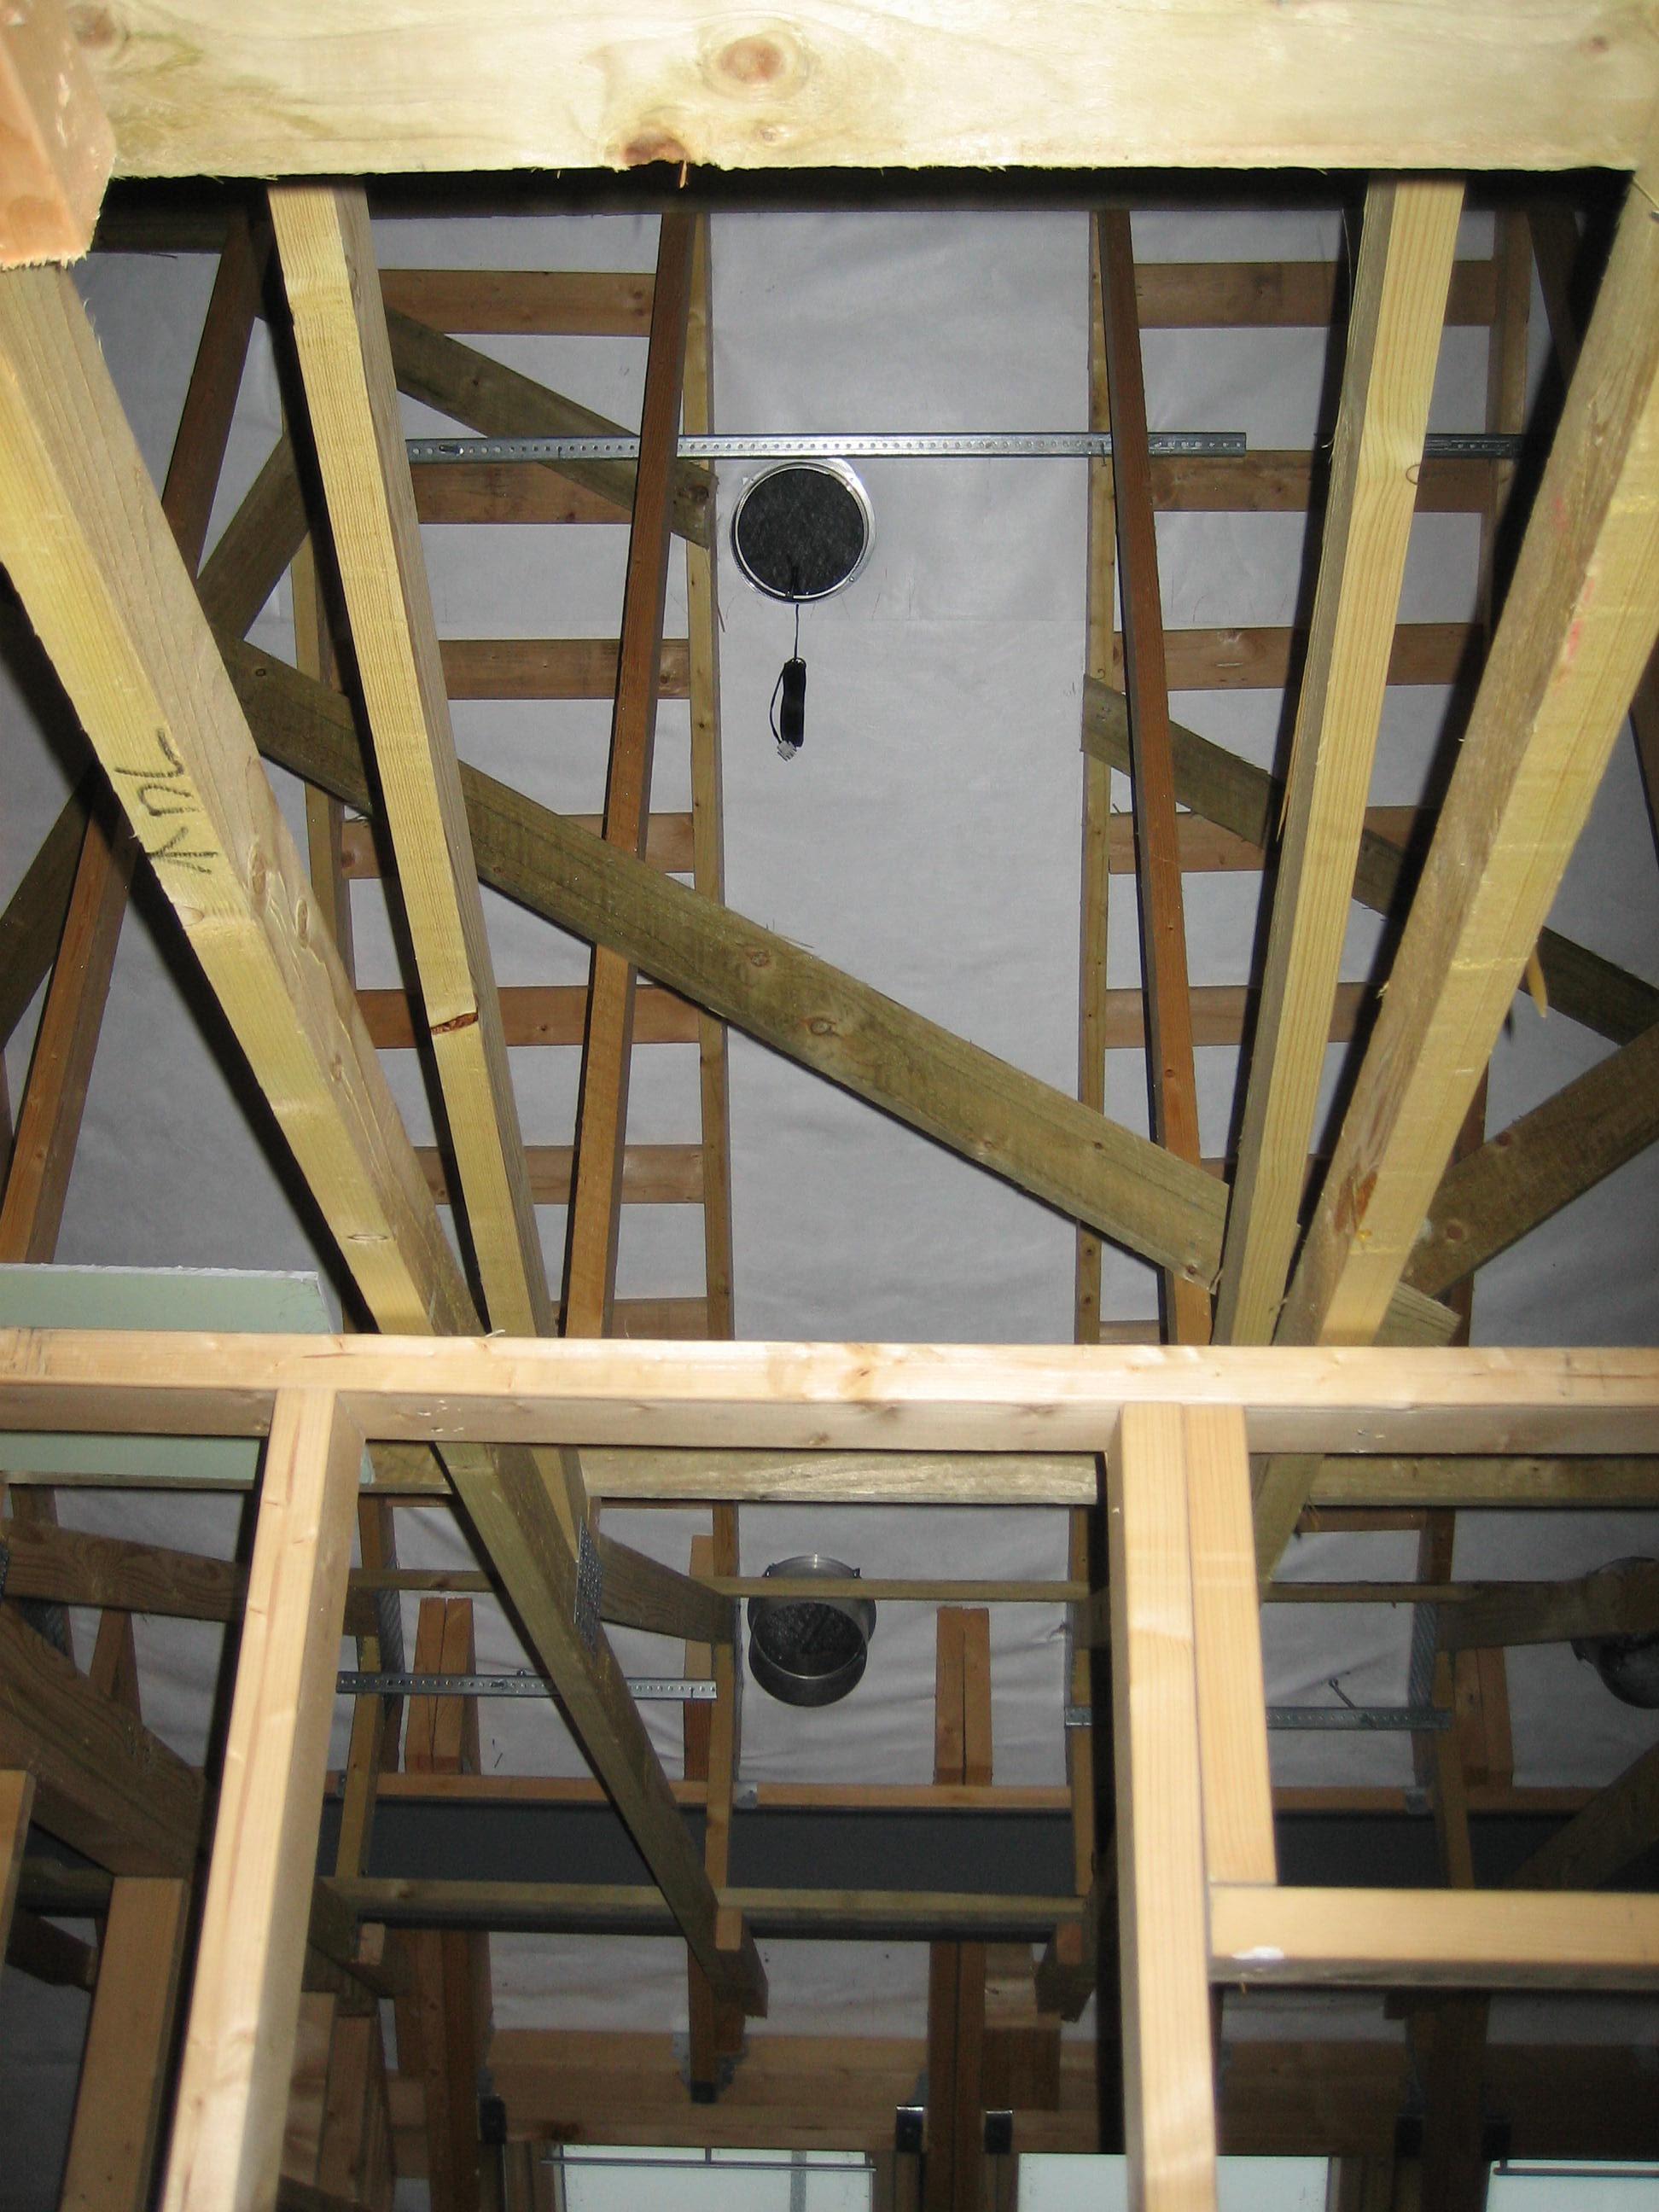 Solar air collector internal air flow and return vents.JPG